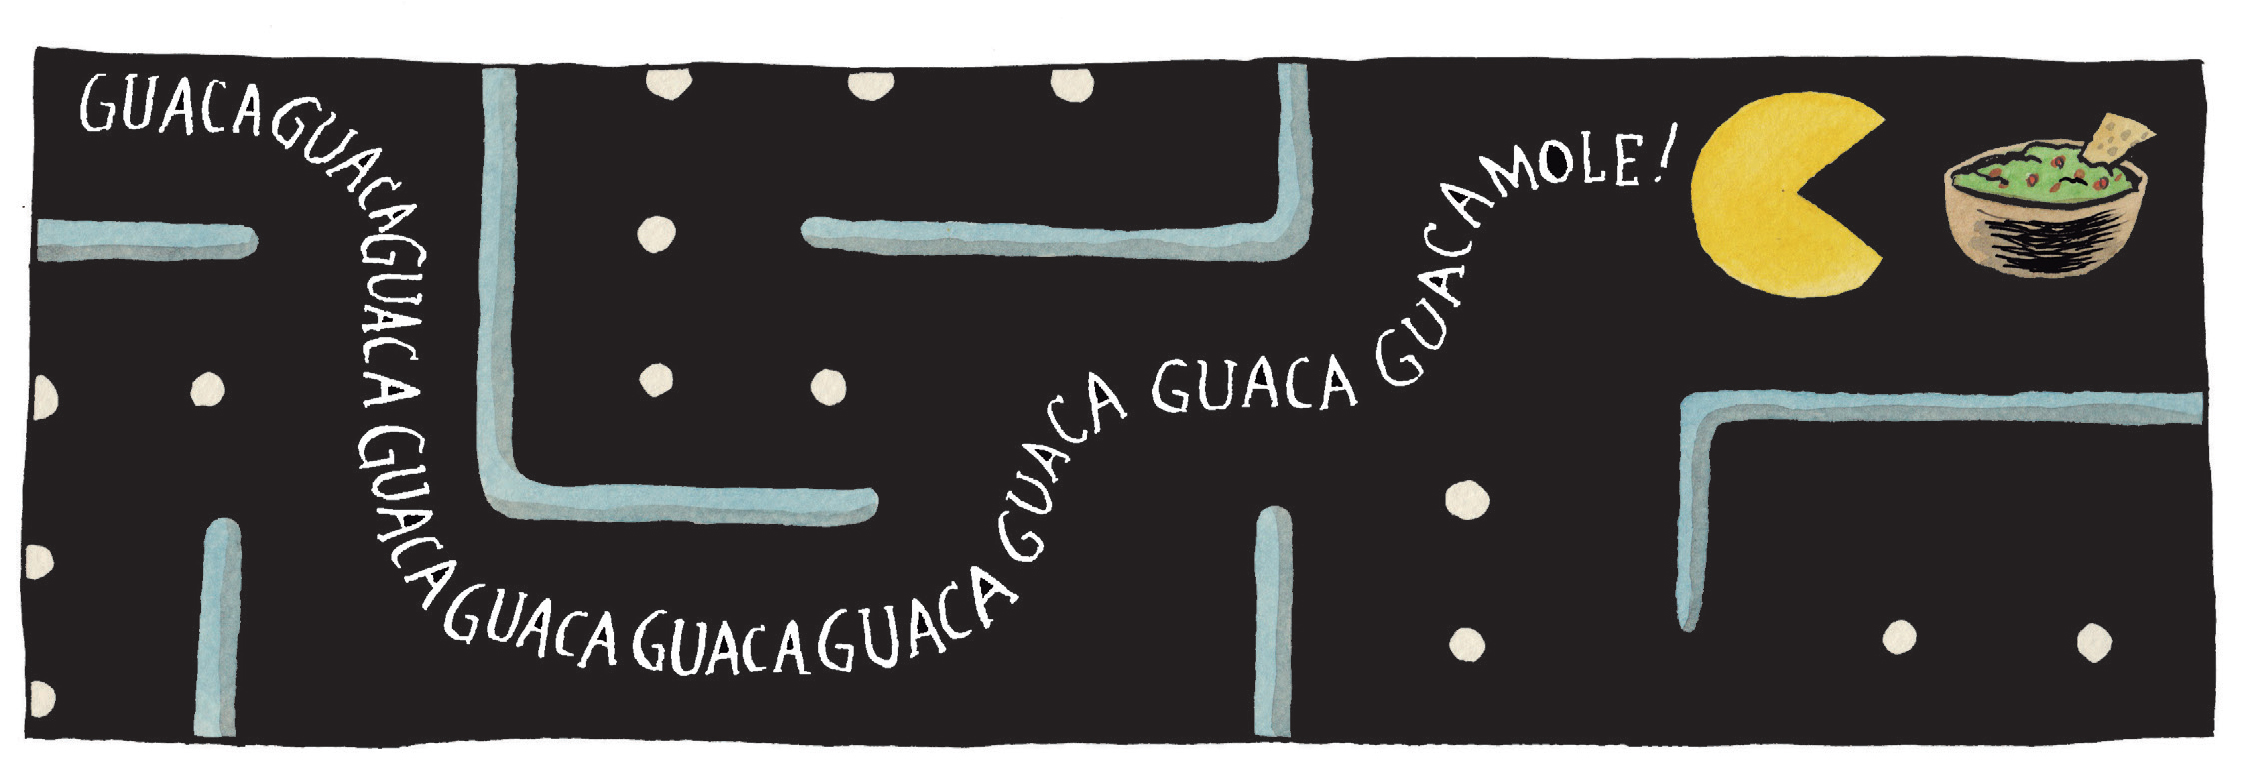 Macanudismo-tira Macanudo10b